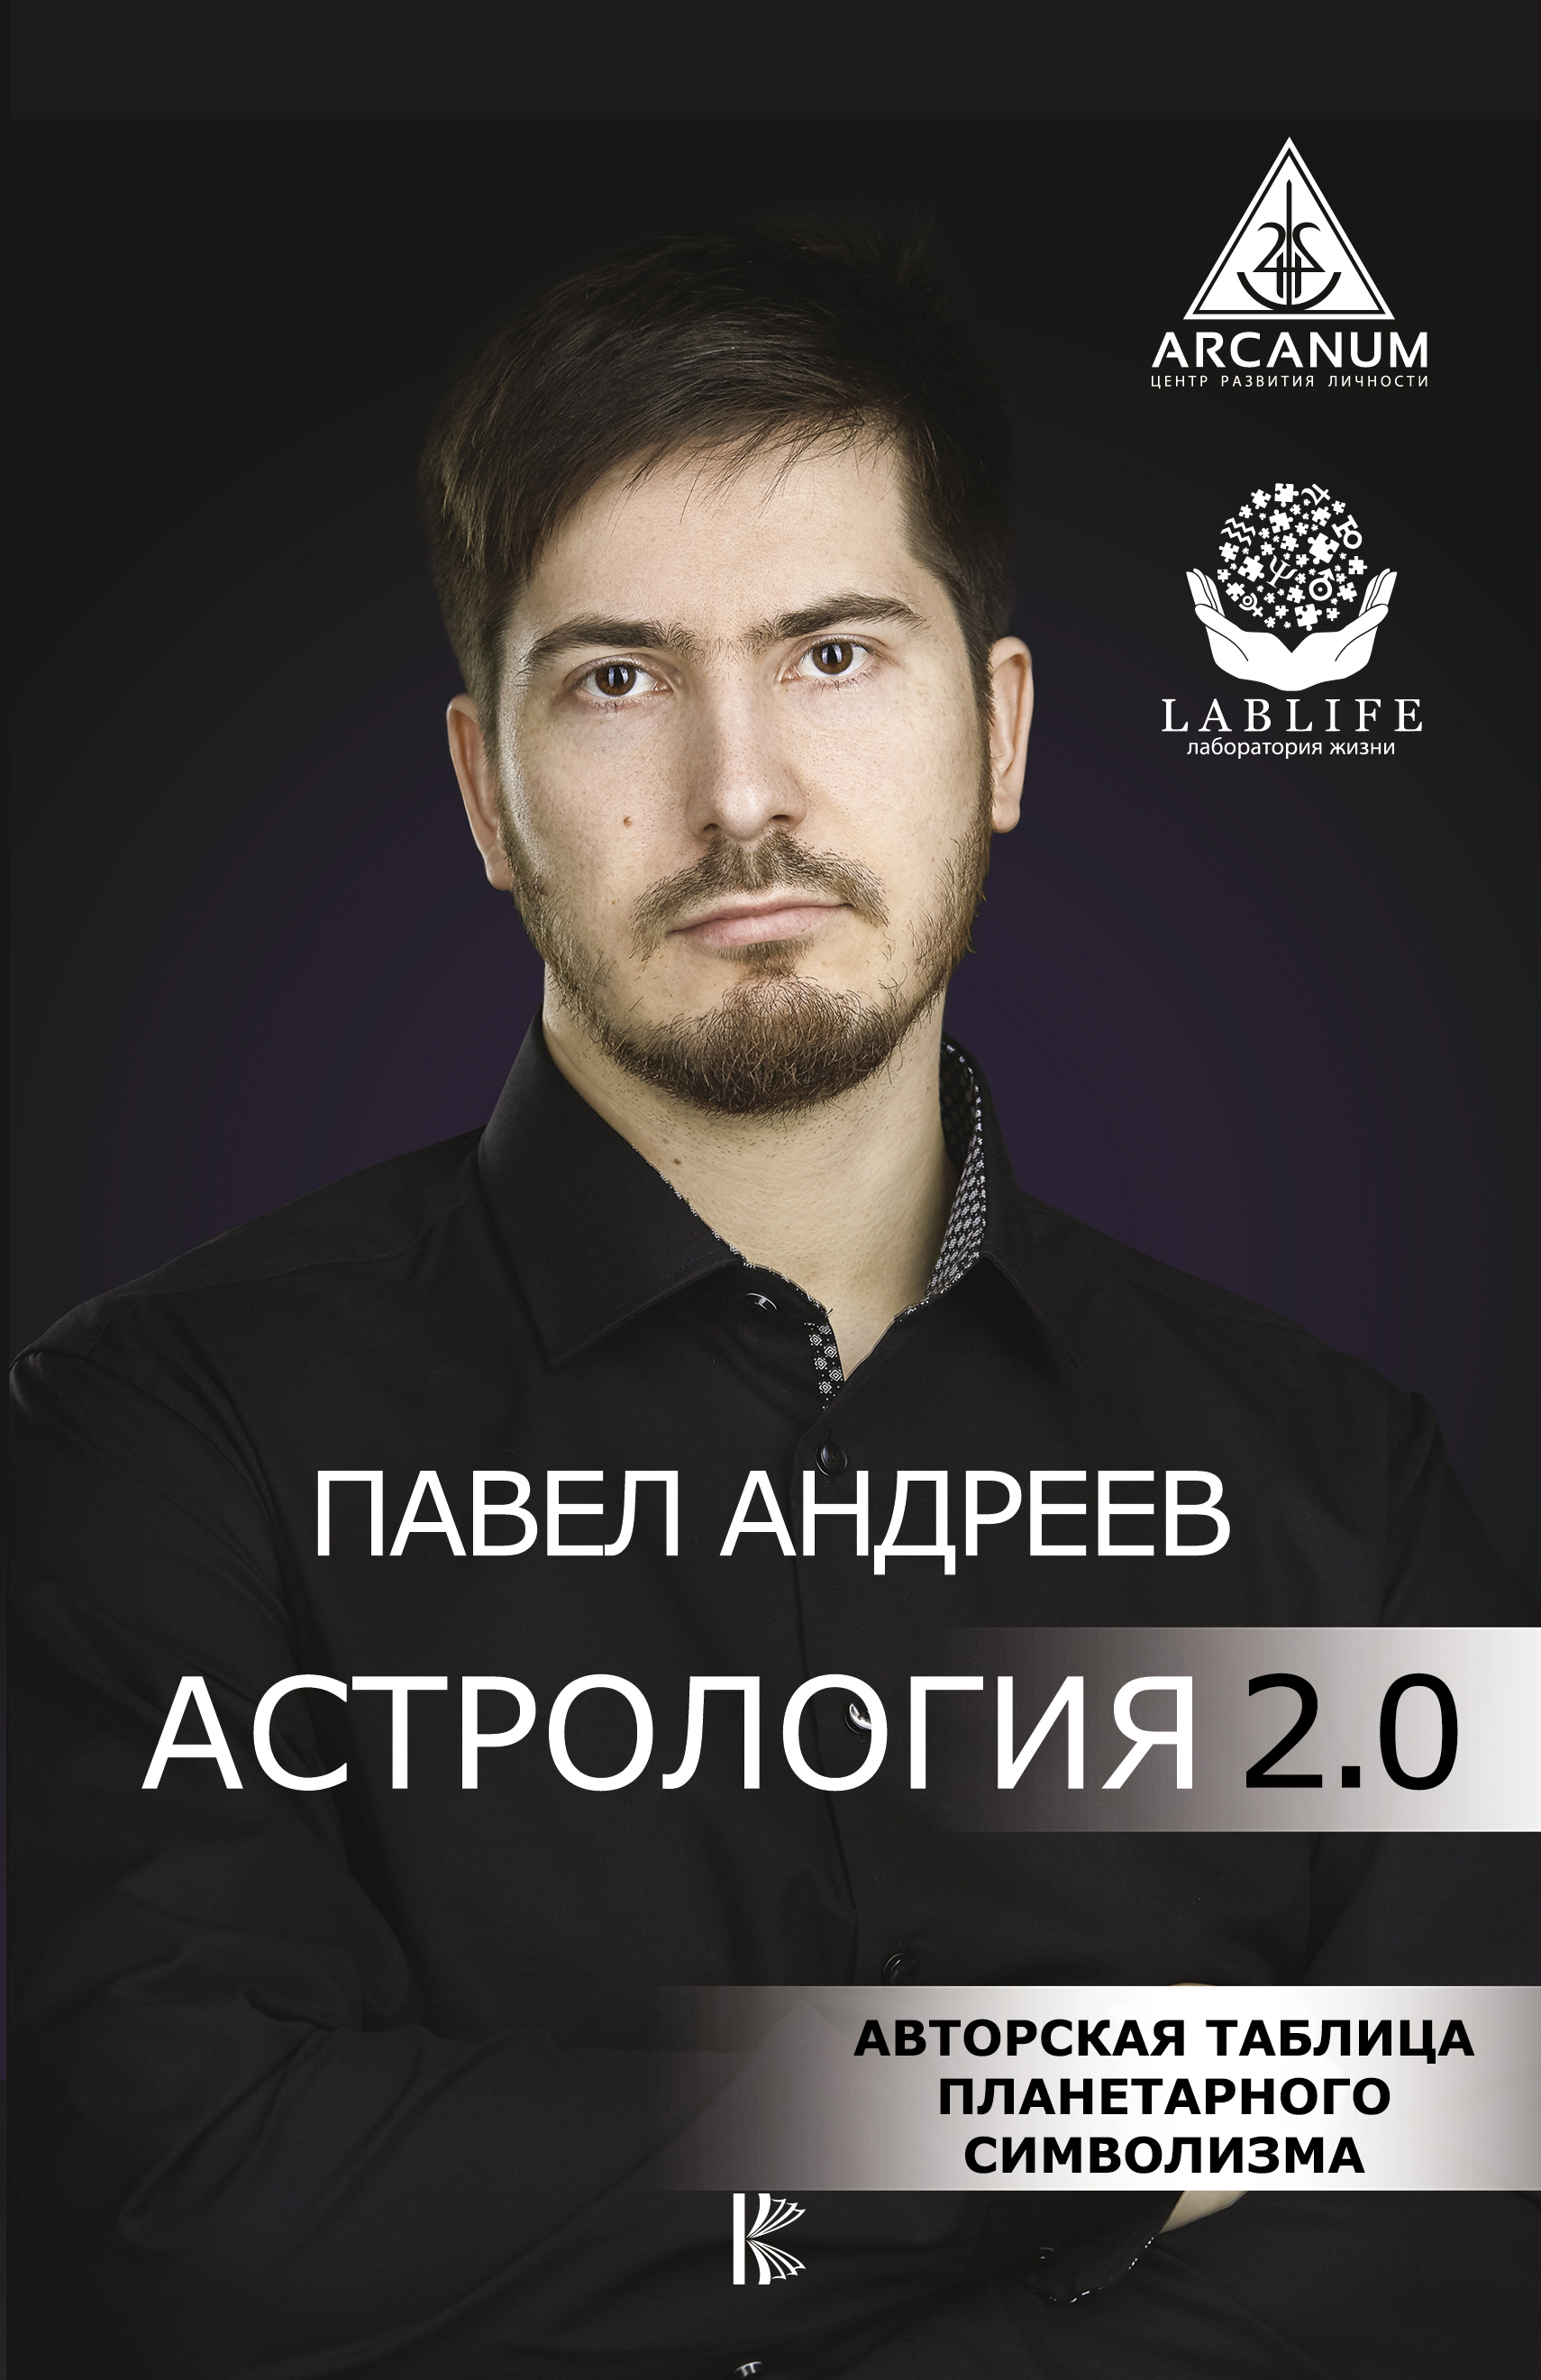 Андреев П. Астрология 2.0 андреев п астрология для жизни